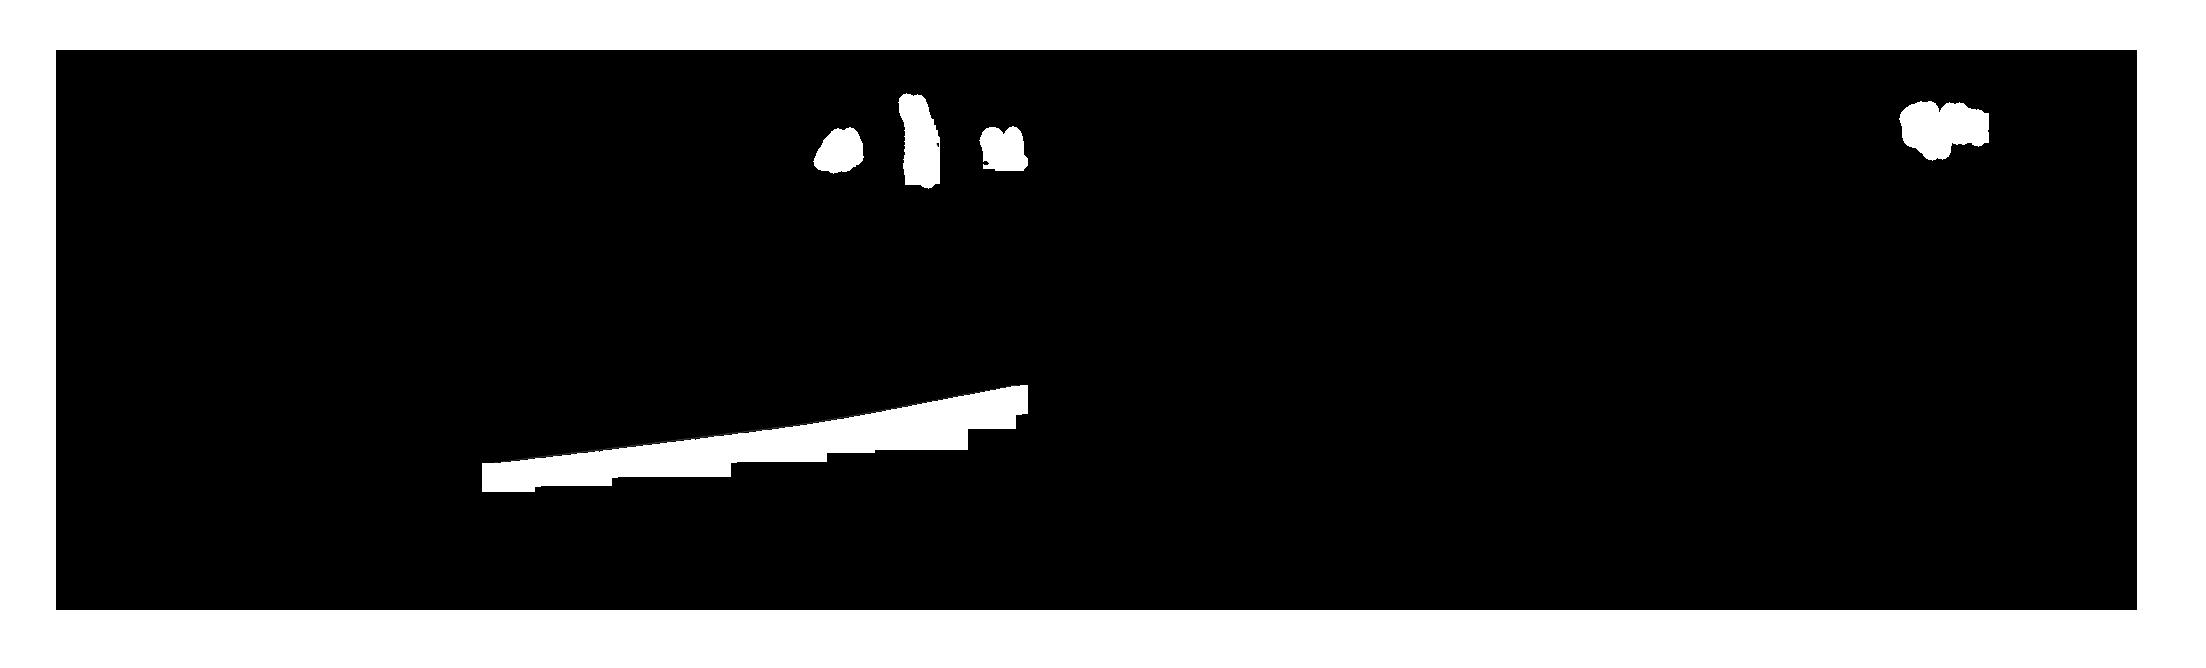 0b35f8ed-73ee-41e6-96db-8aacd6c1e8f5